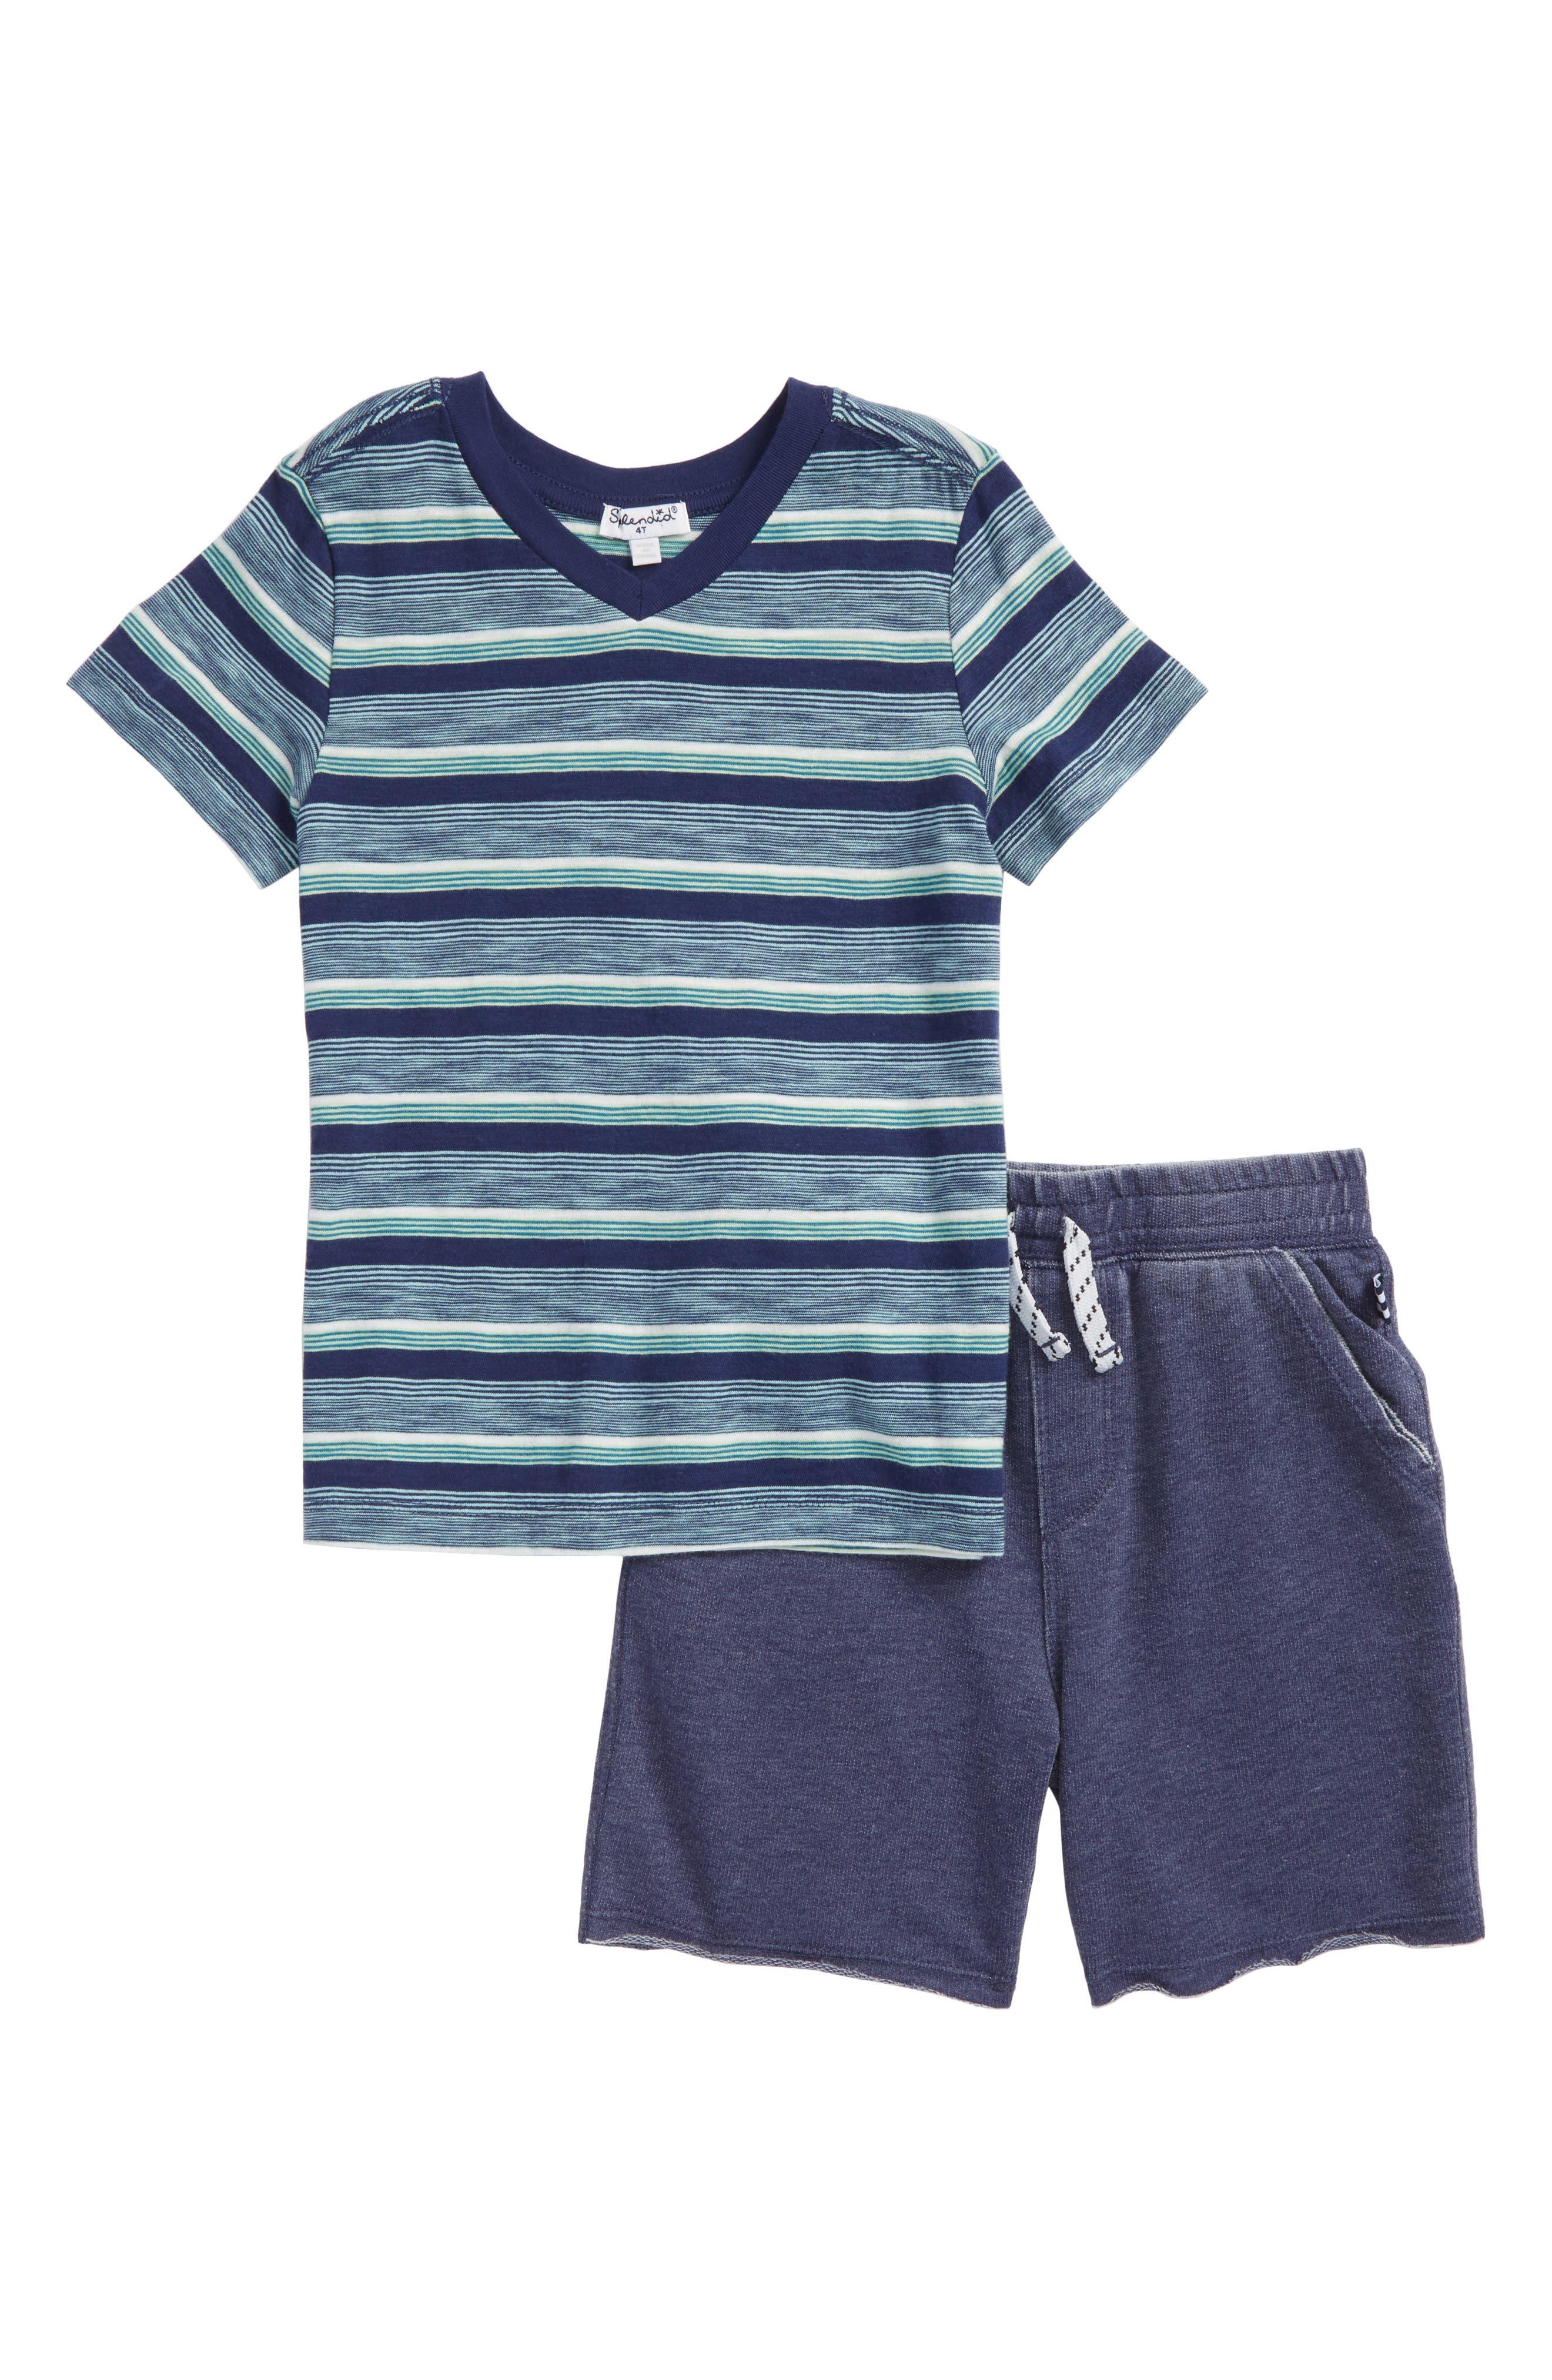 V-Neck T-Shirt & Shorts Set,                             Main thumbnail 1, color,                             Indigo Sky